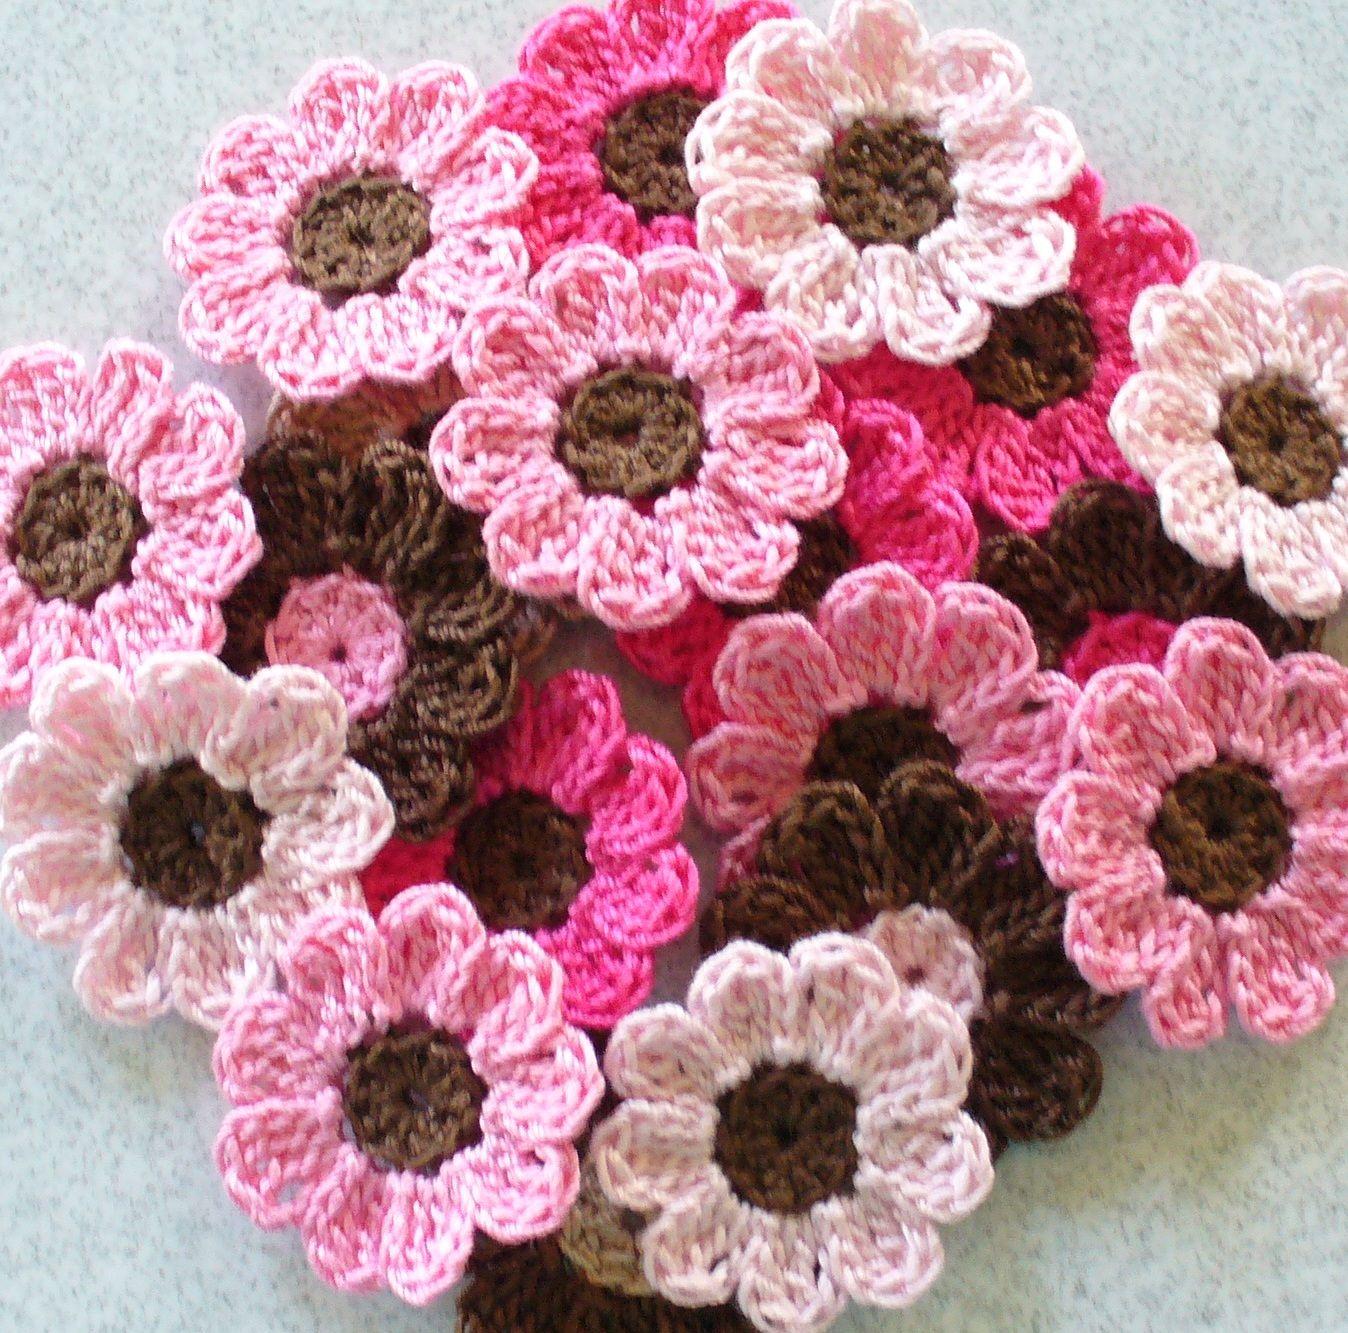 Flores Rosas Com Boto Marrom Decorao Casa Pinterest Rose Crochet Crochetflowers Pretty Flower Diagram Handmade Flowers Appliques Embellishments Pink Brown Set Of 21 On Luulla